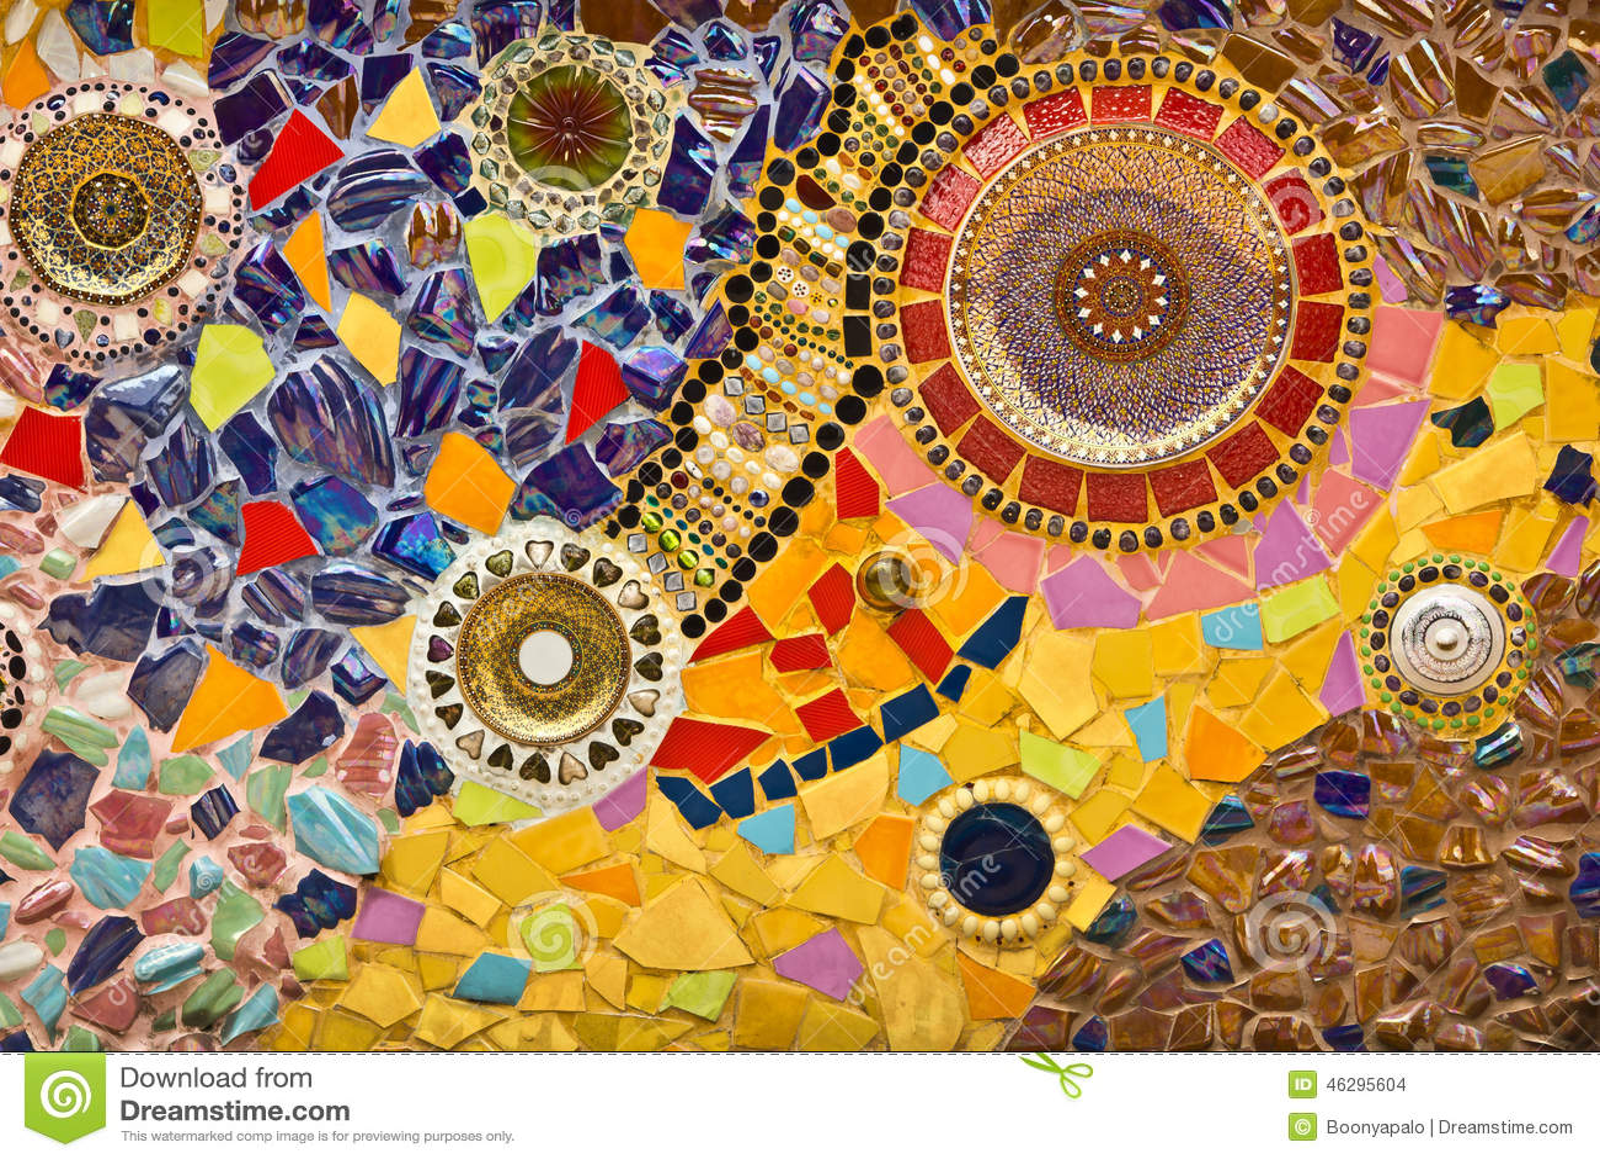 Ornamento Decorativo De La Pared Del Mosaico De La Teja Rota